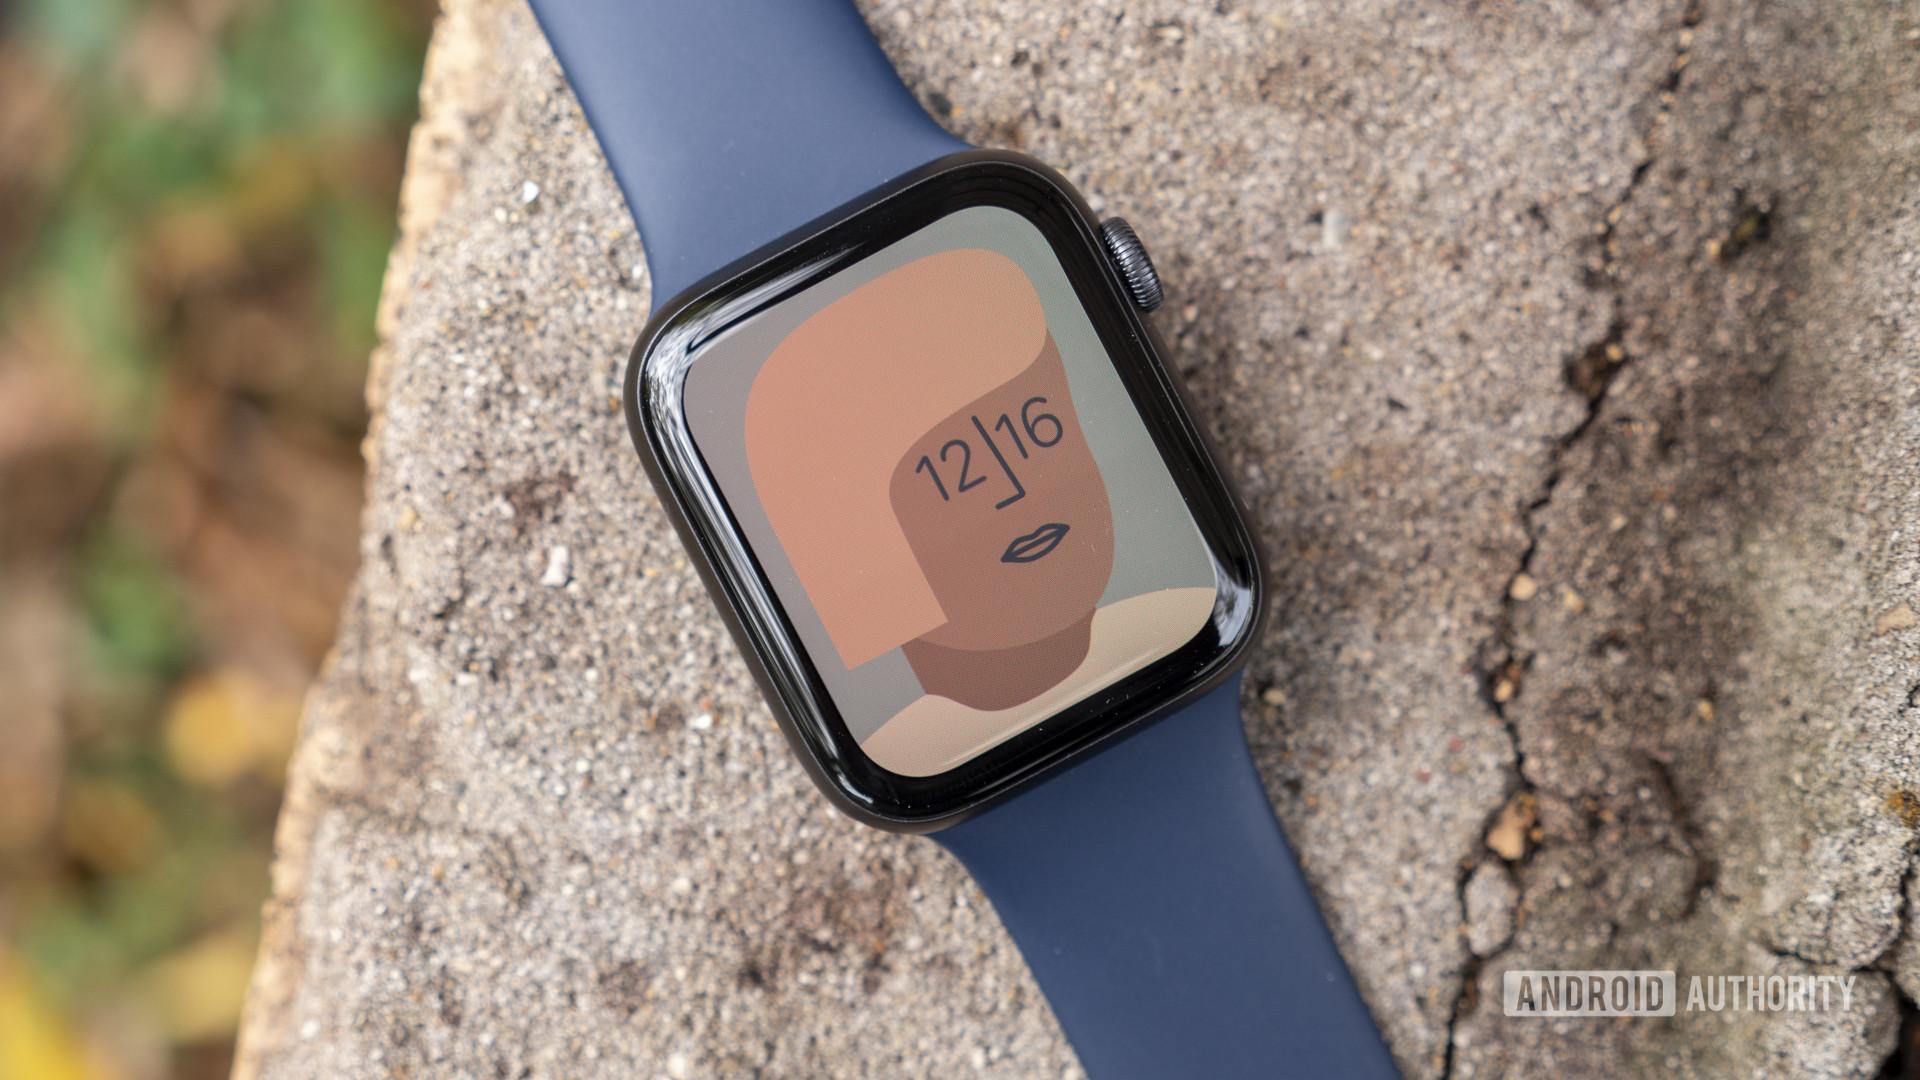 apple watch series 6 review artist watch face display 1